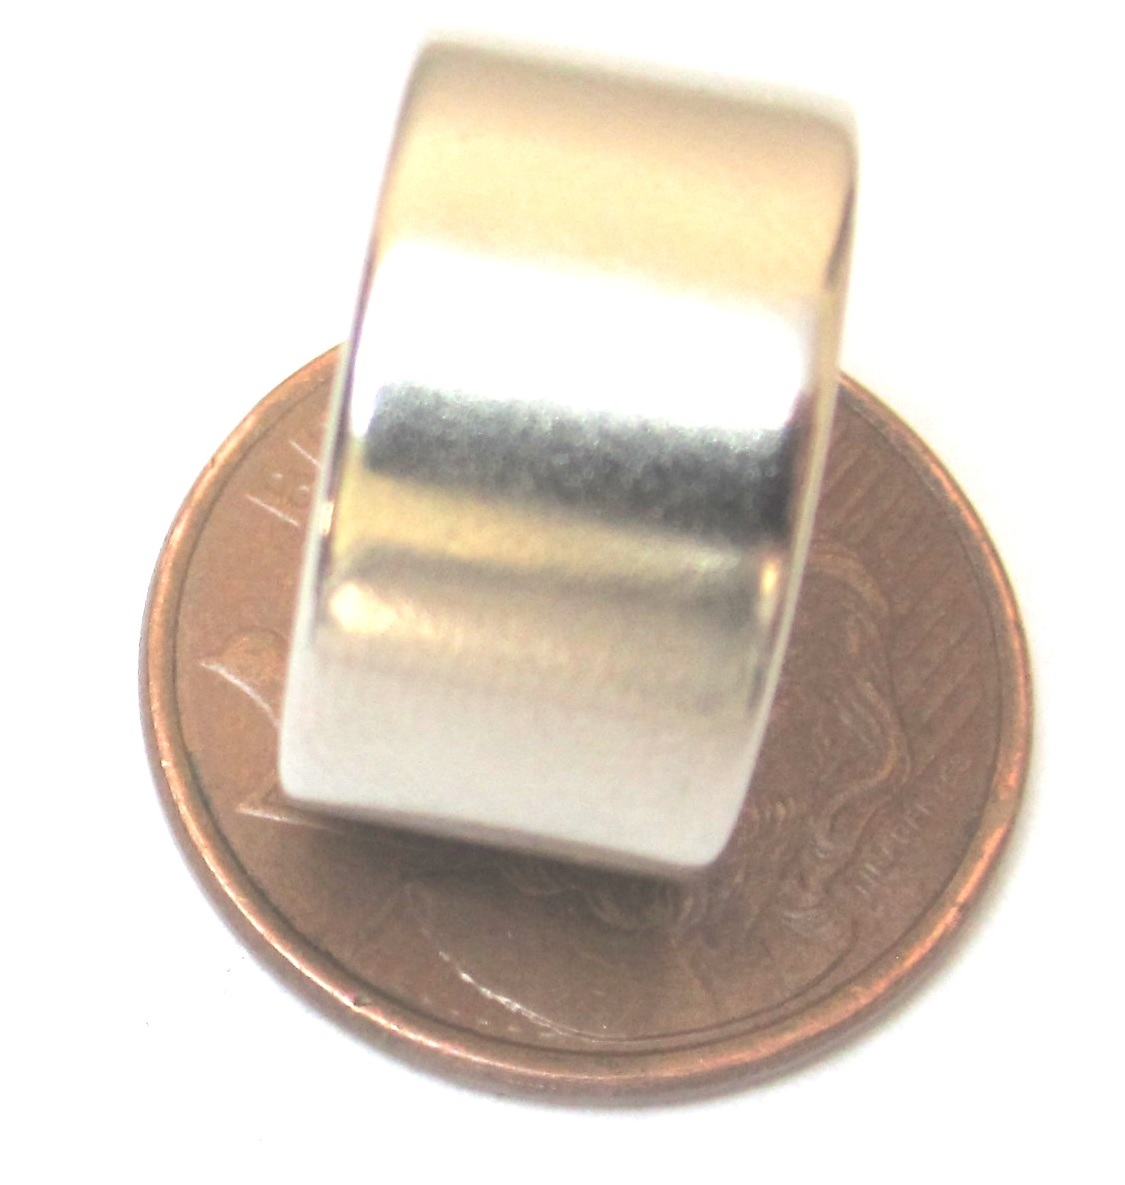 Imã de Neodímio Disco N35 18x10 mm  - Polo Magnético